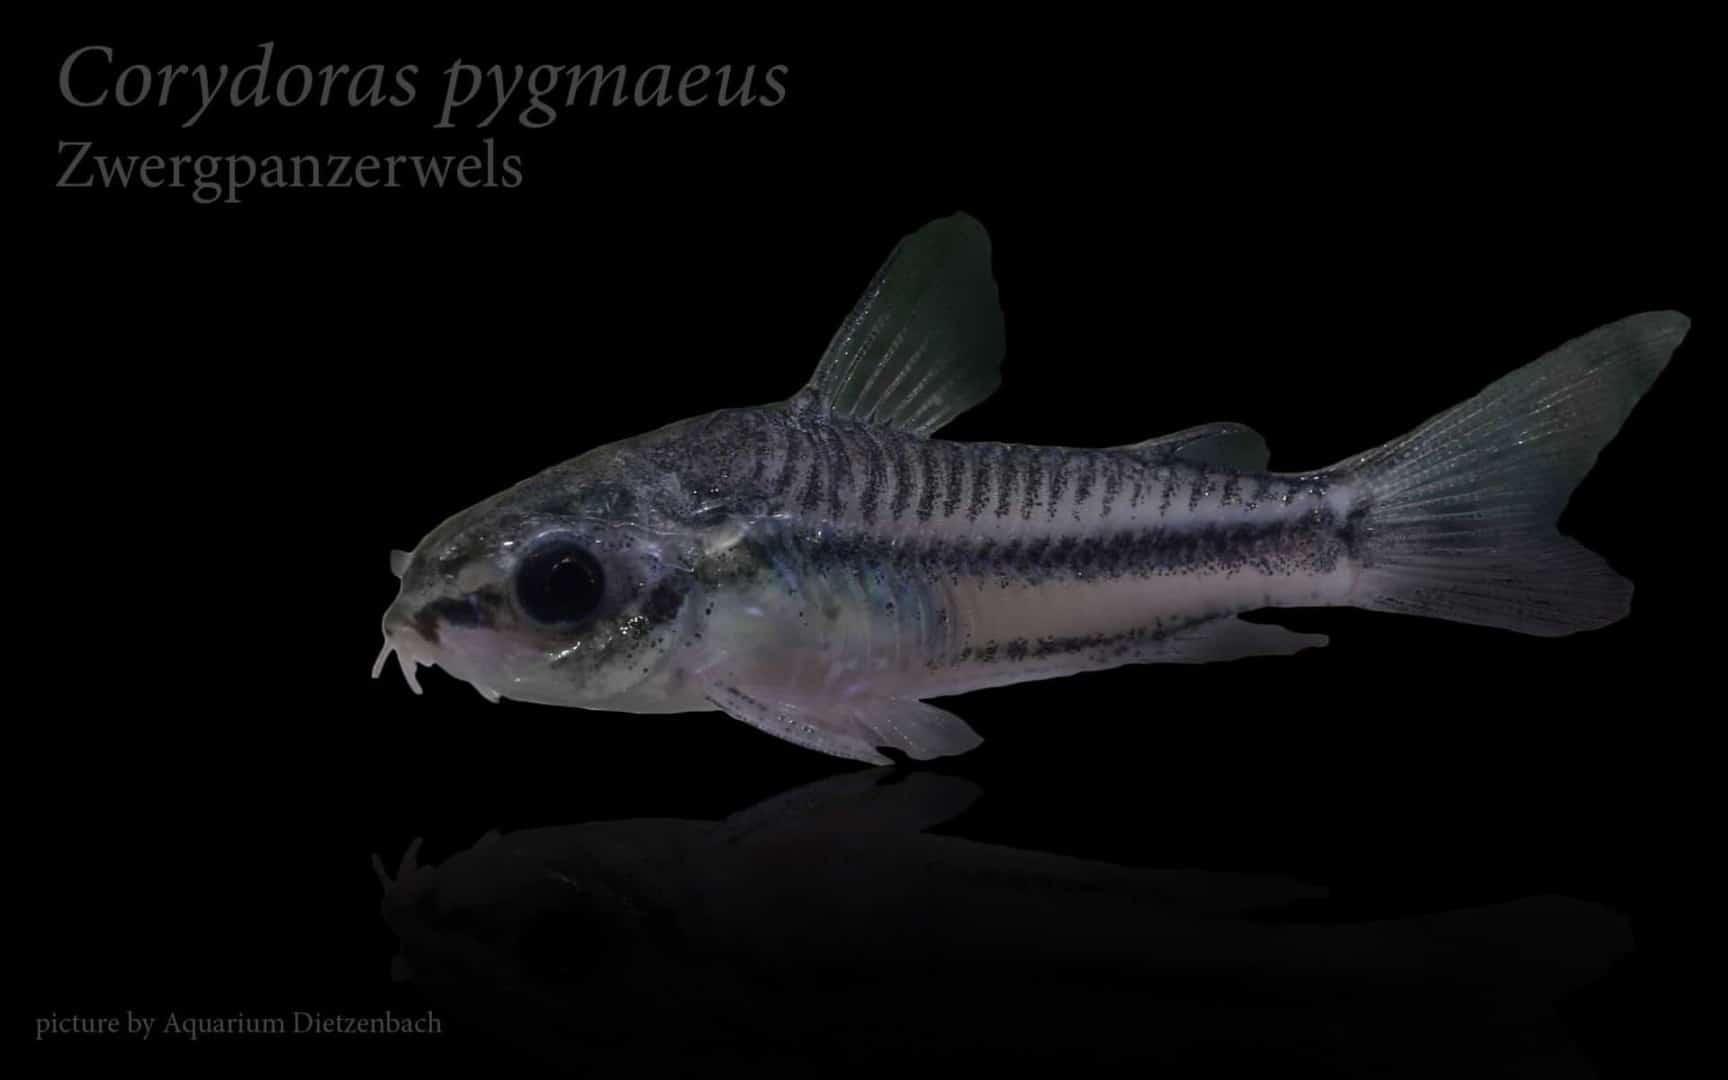 Corydoras pygmaeus - Zwergpanzerwels 8